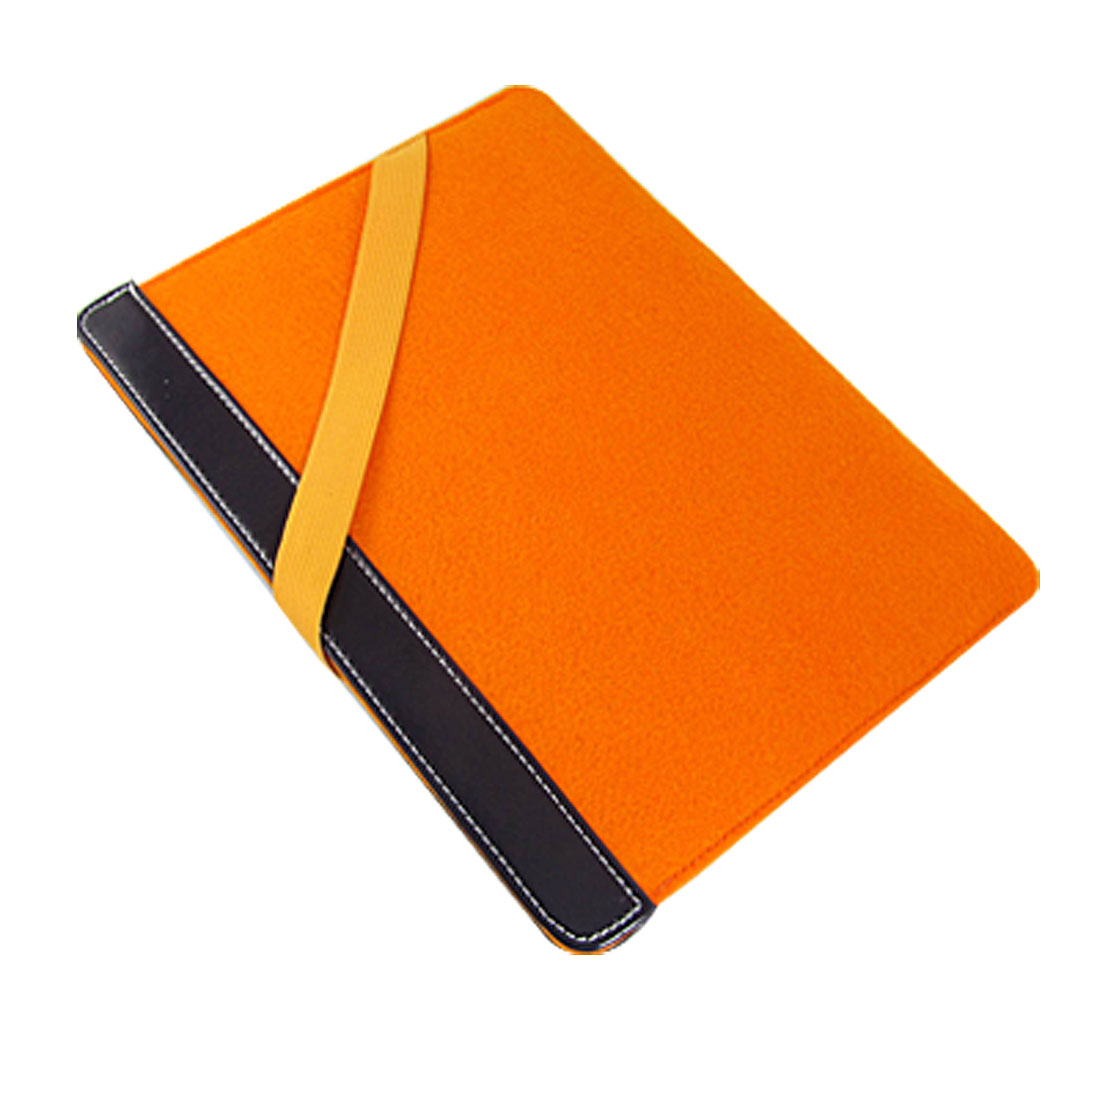 Orange Elastic Strap Protective Bag Sleeve for Apple iPad 1